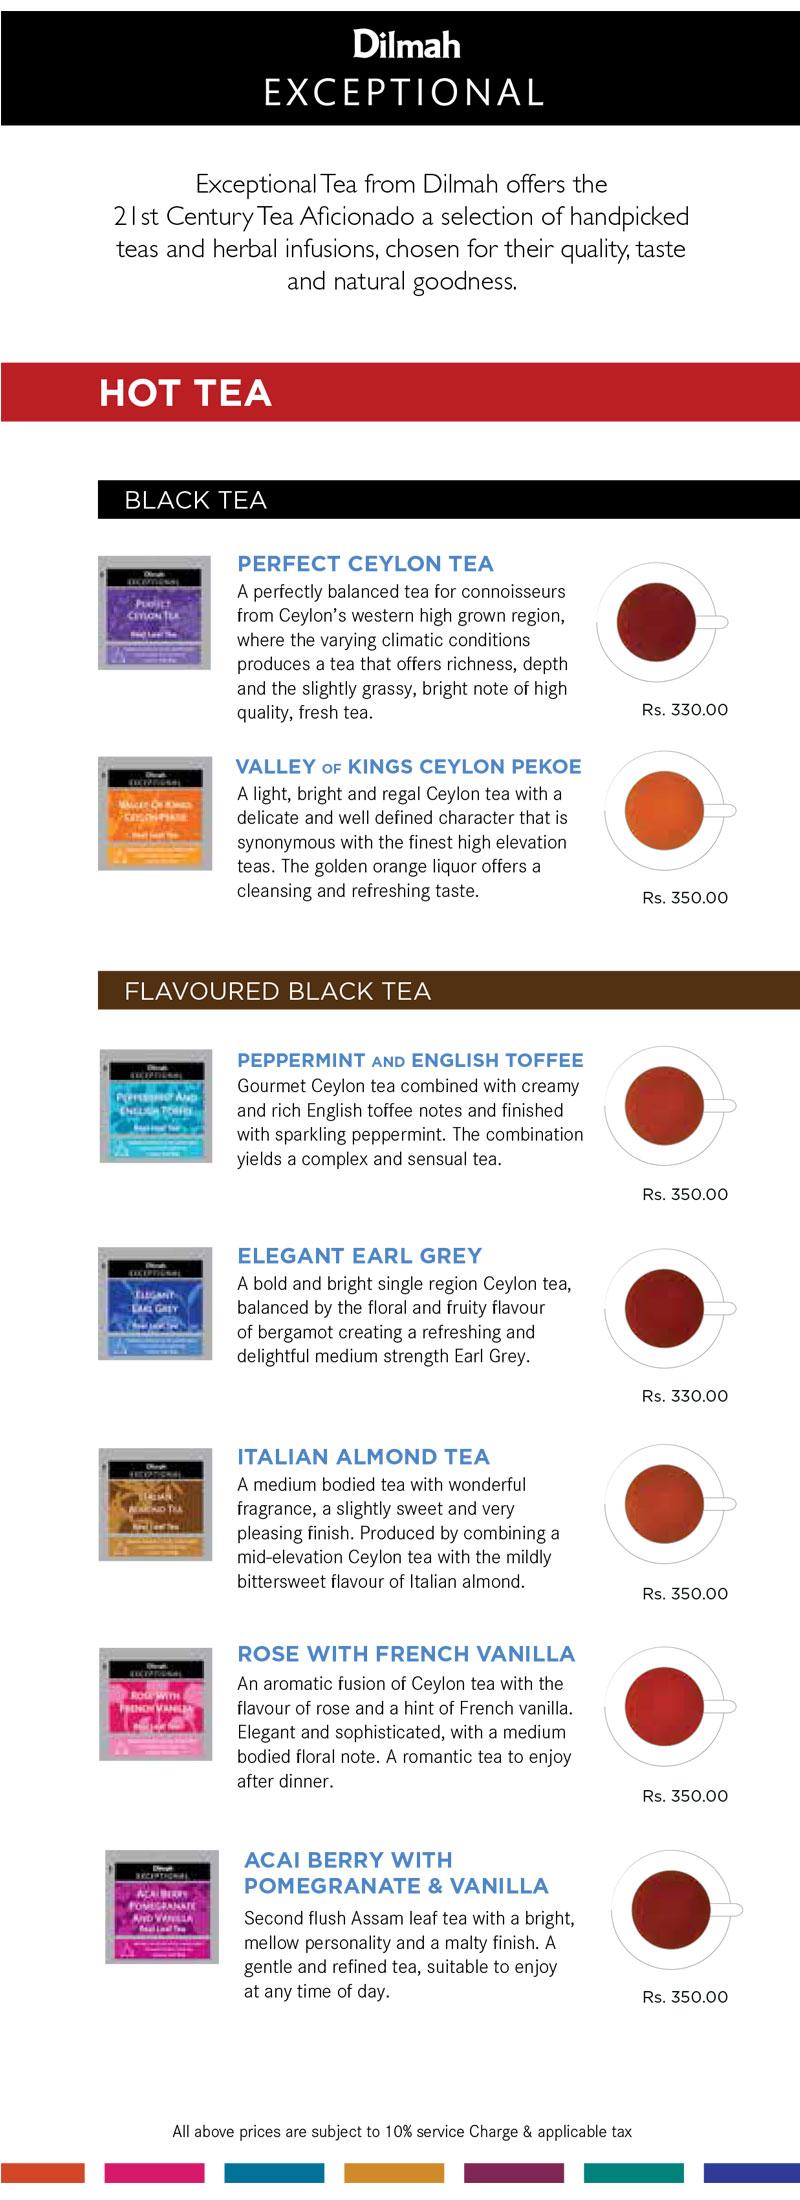 Dilmah Exceptional Teas